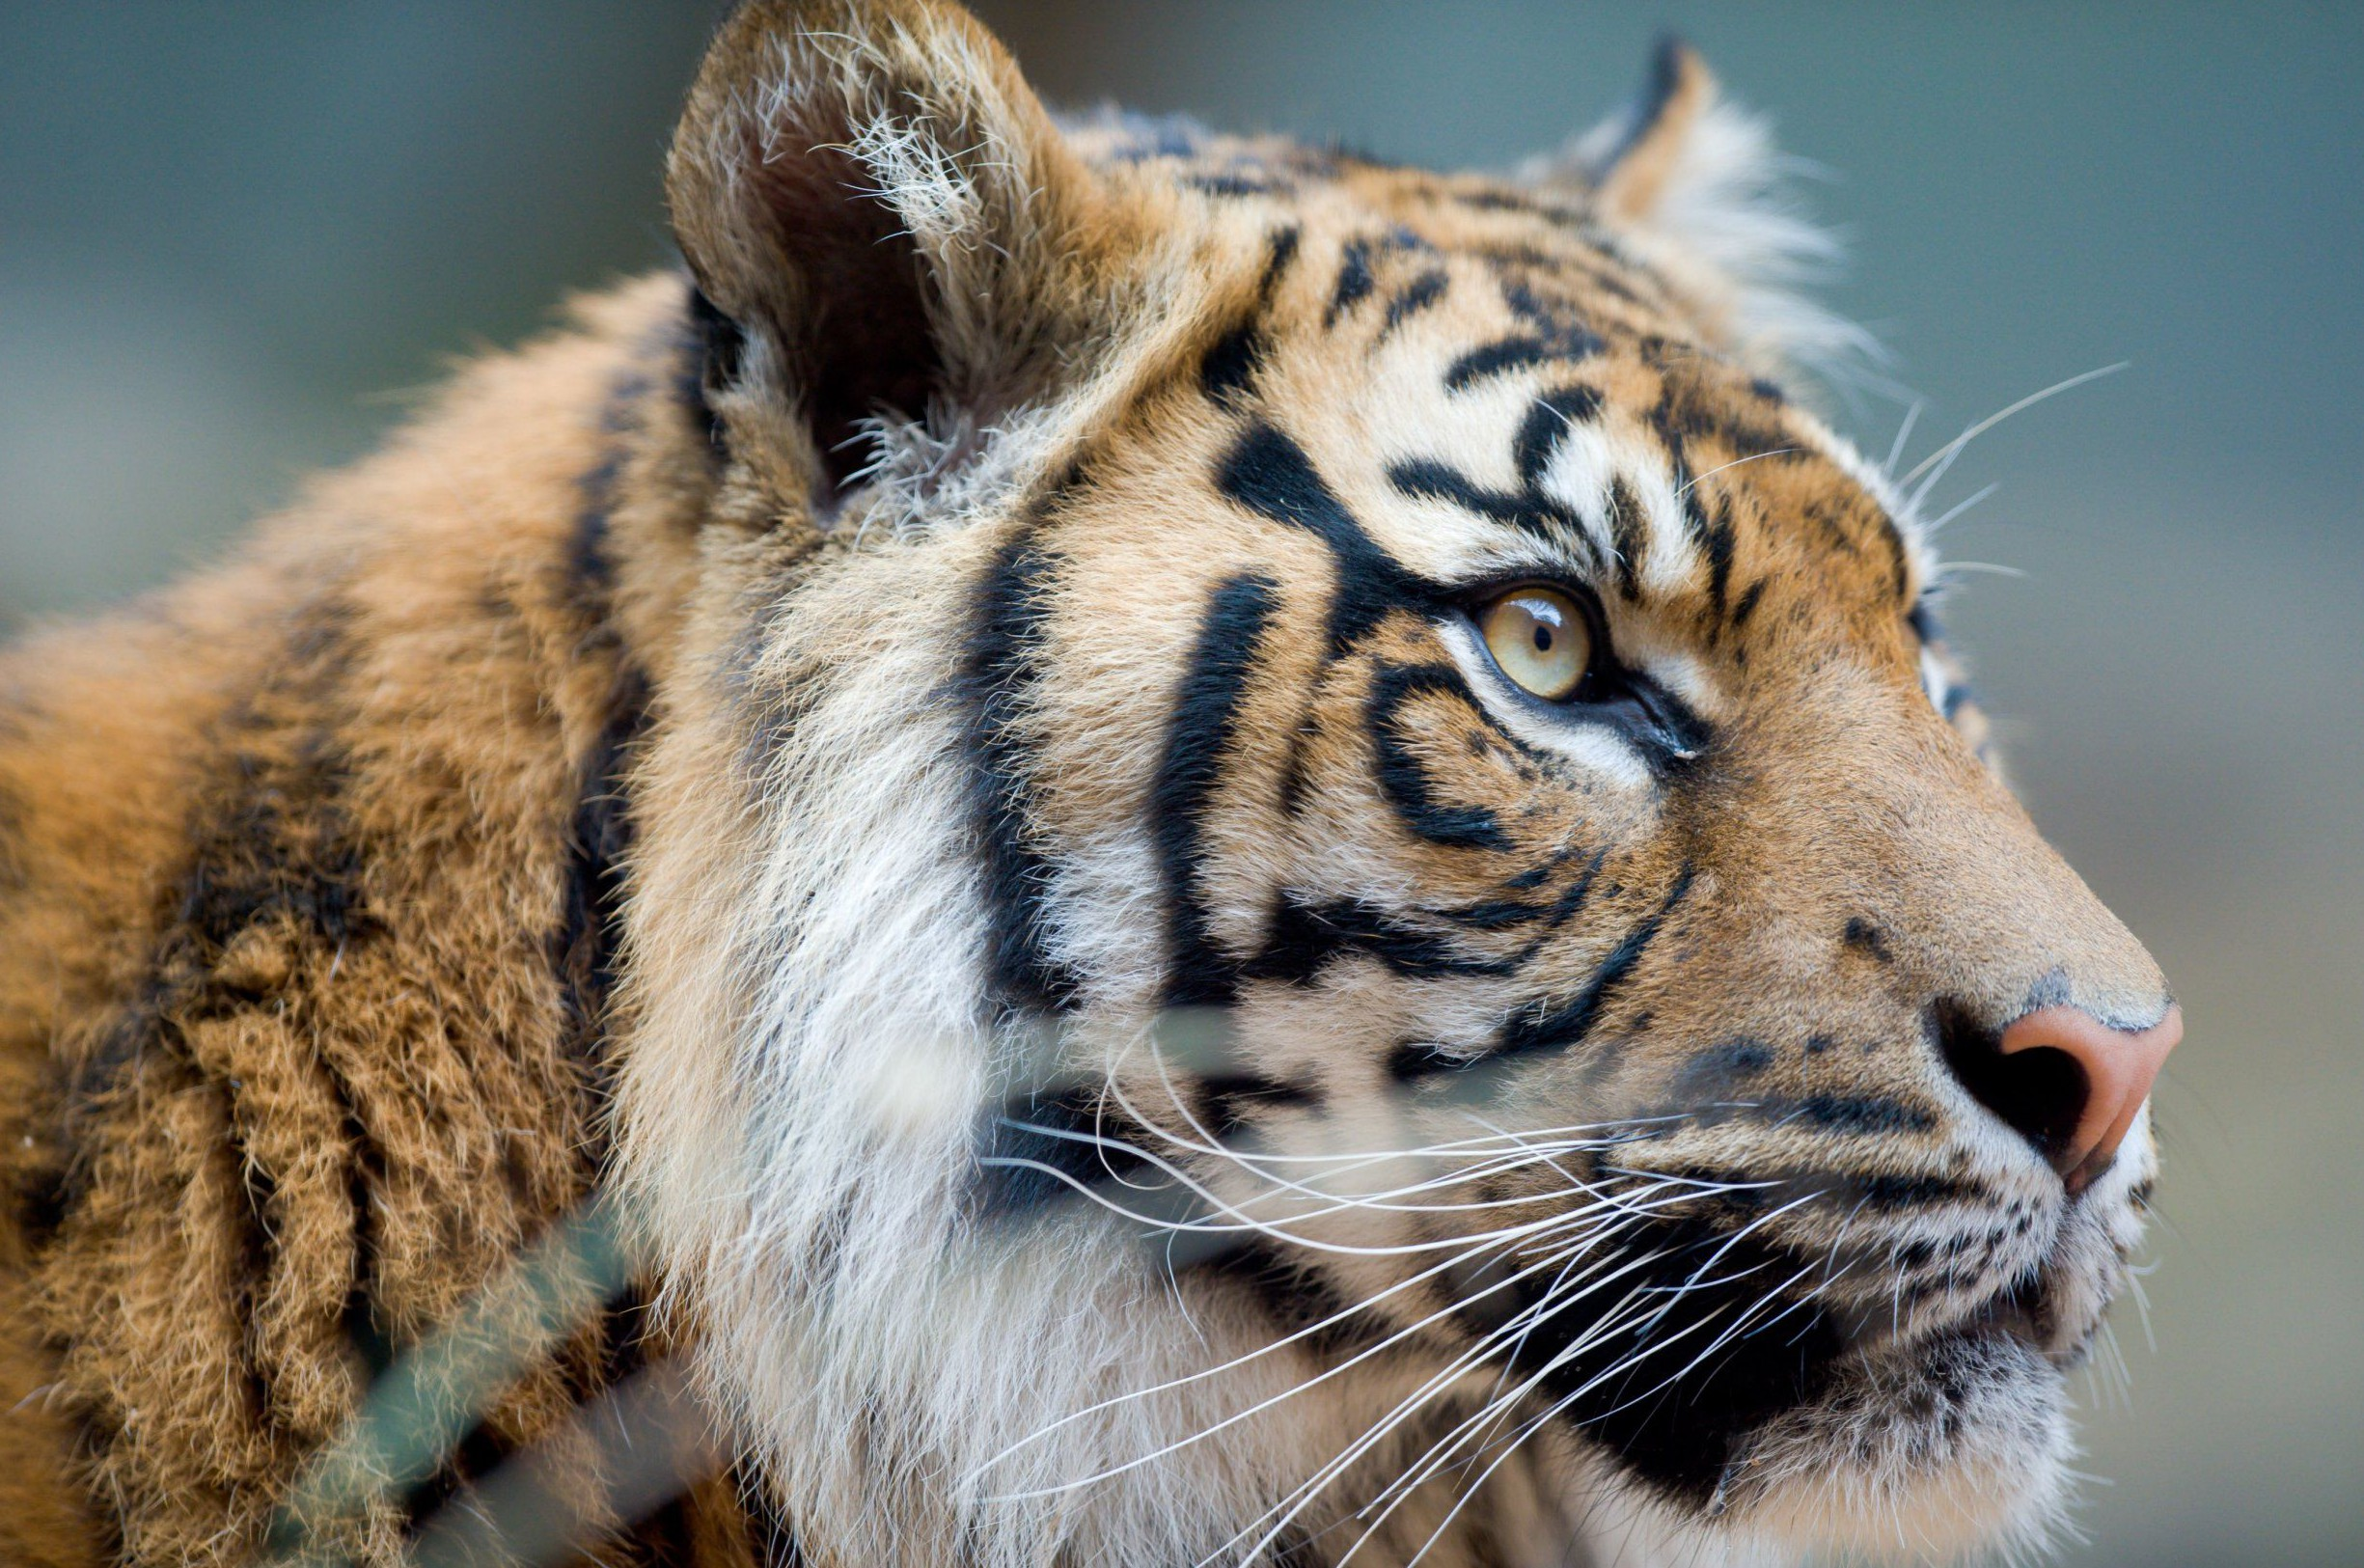 Mandatory Credit: Photo by Ian Bird/REX/Shutterstock (3024770n) Sumatran Tiger Taronga Zoo, Sydney, Australia - 11 Sep 2013